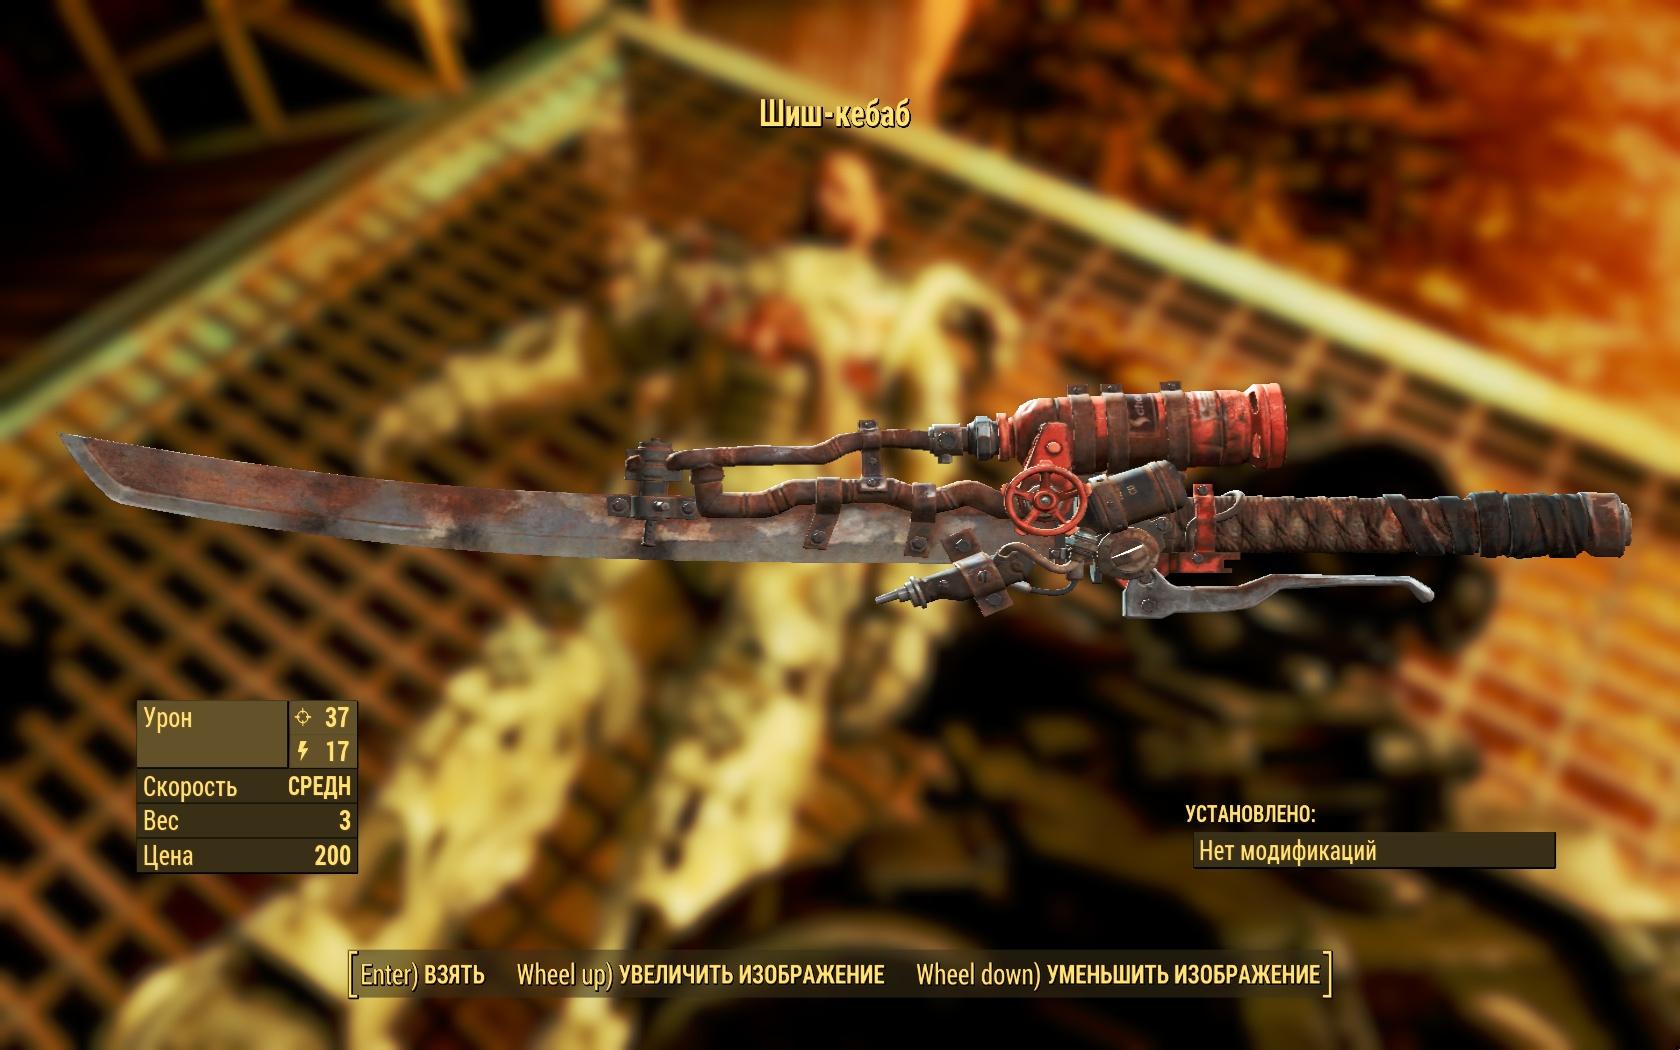 Шиш-кебаб - Fallout 4 Оружие, Шиш-кебаб